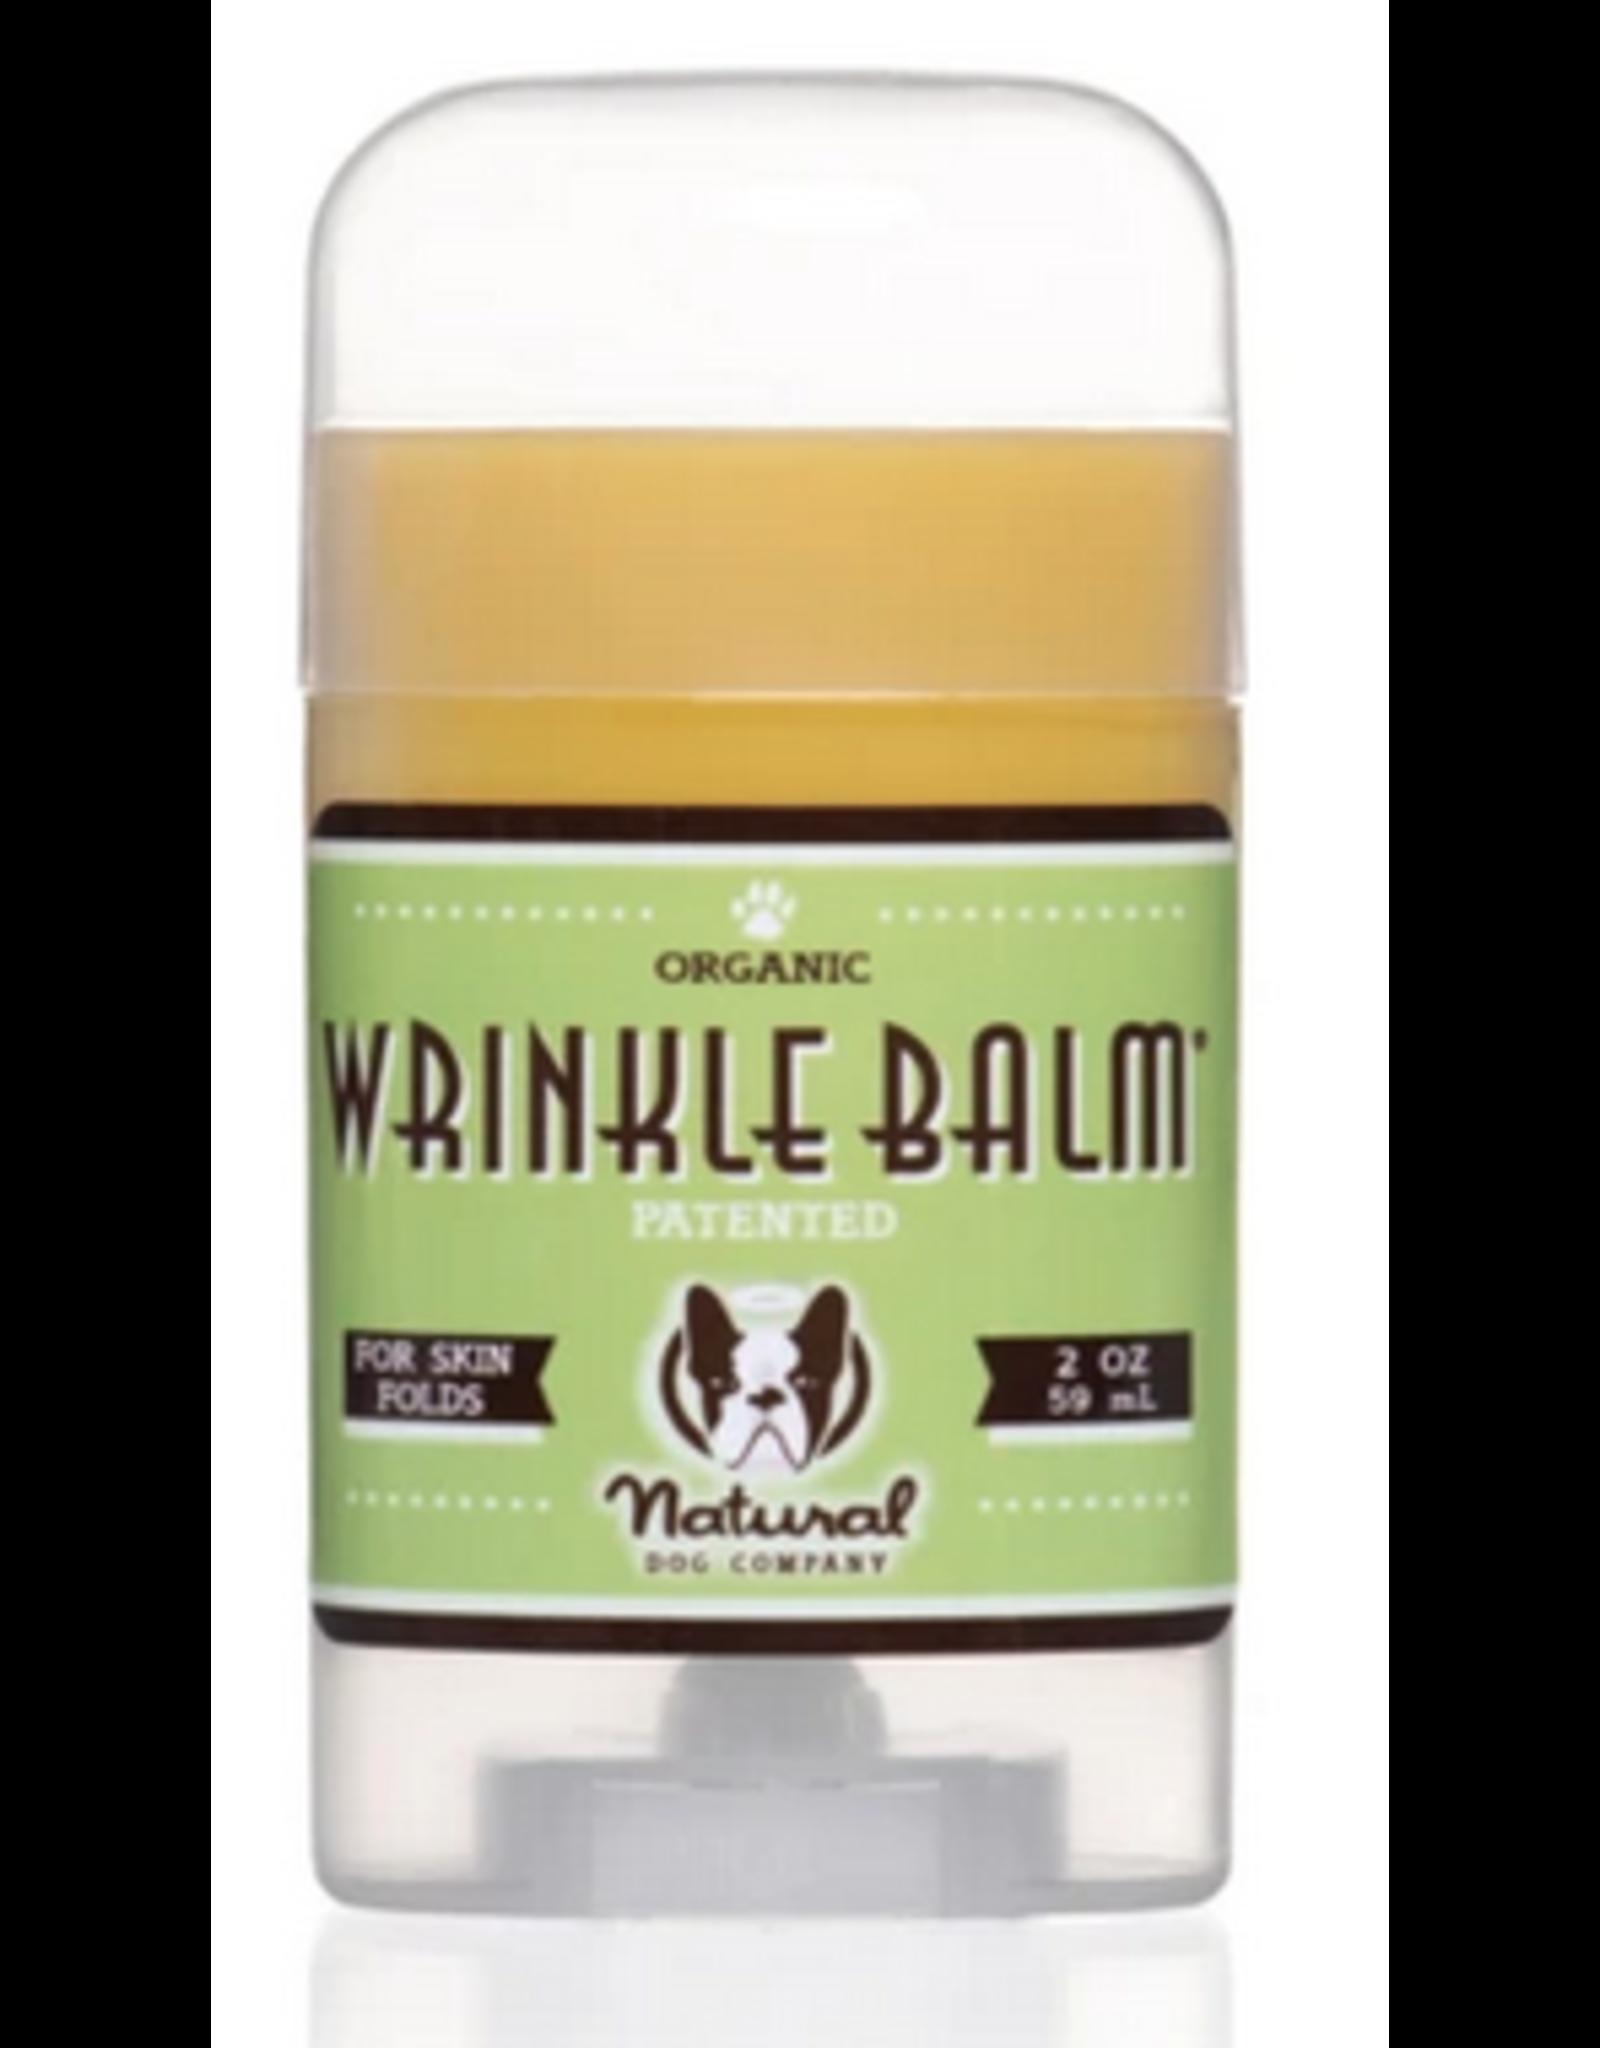 Natural Dog Company Natural Dog Company - Wrinkle Balm Stick 2oz